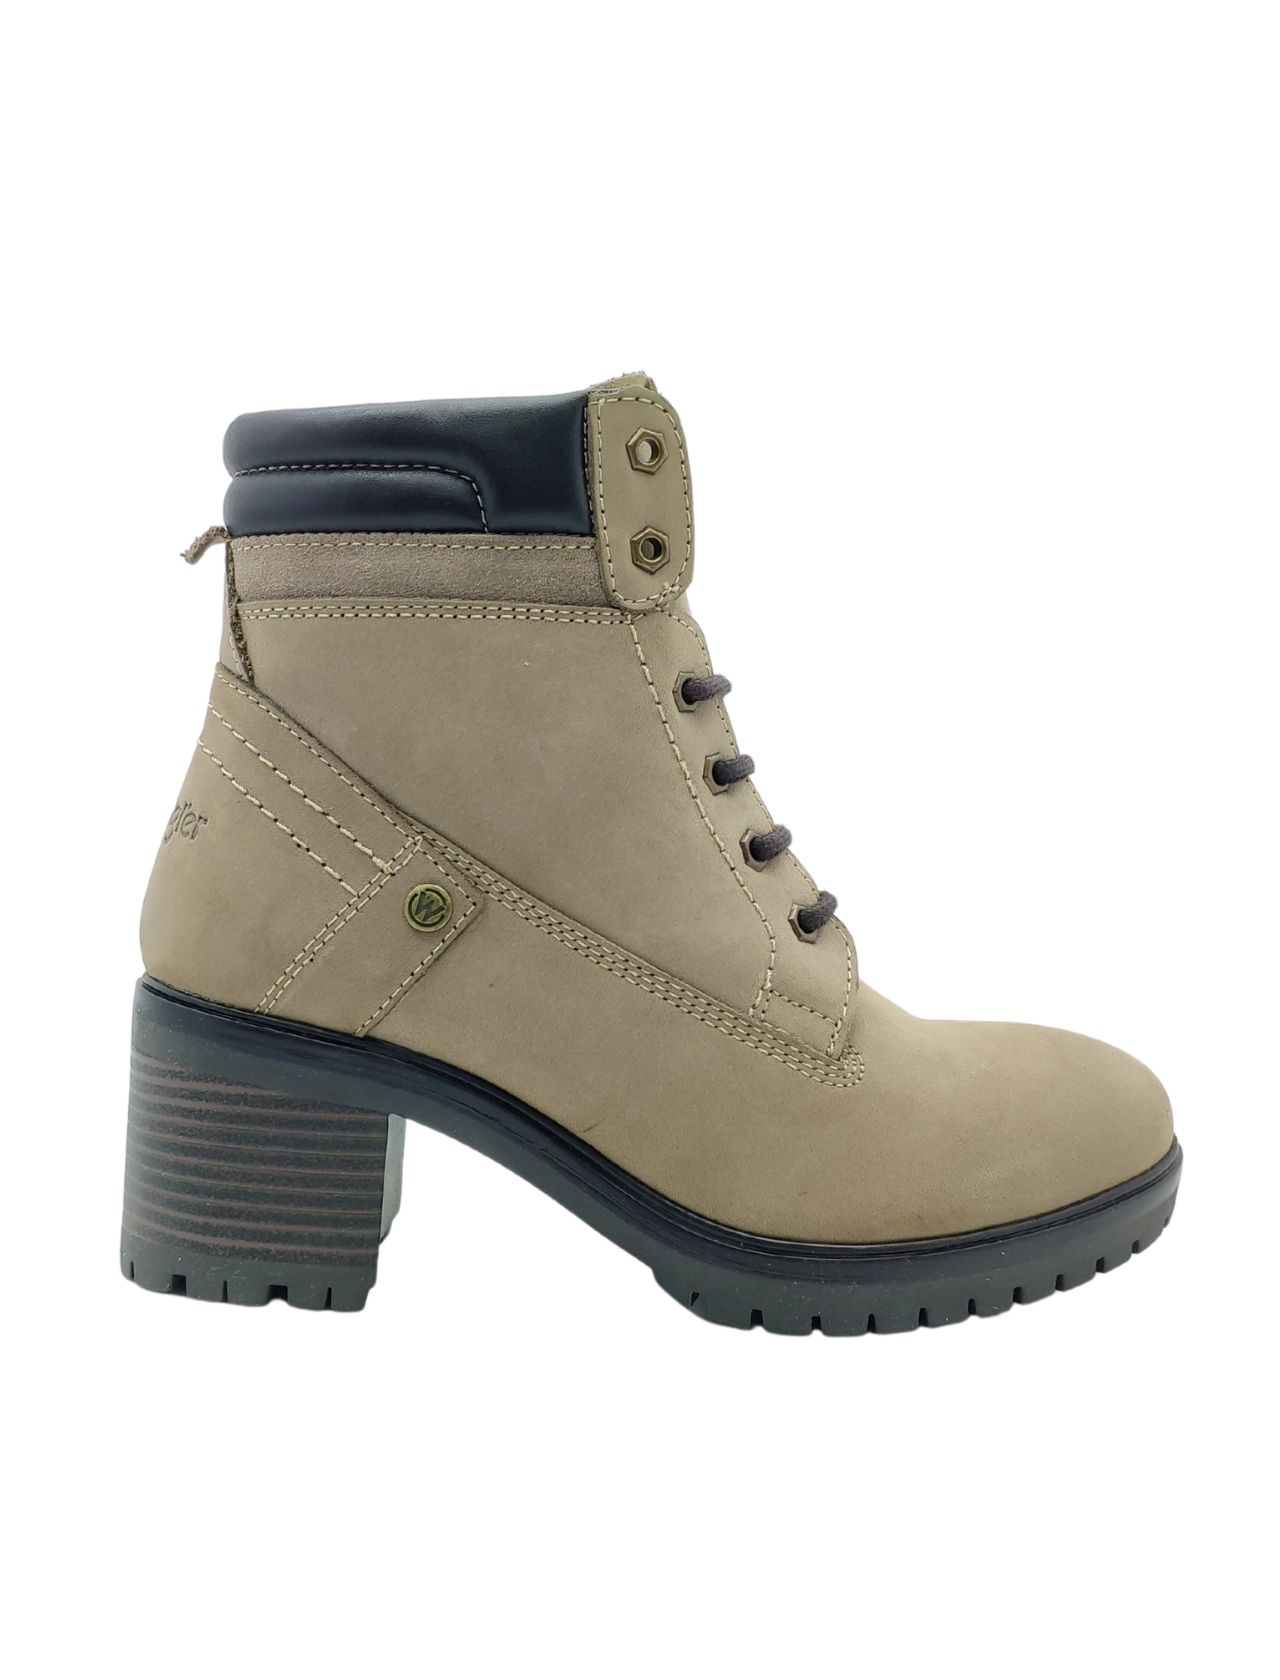 Women's Amphibious Ankle Boots Wrangler | Ankle Boots | WL02510A029